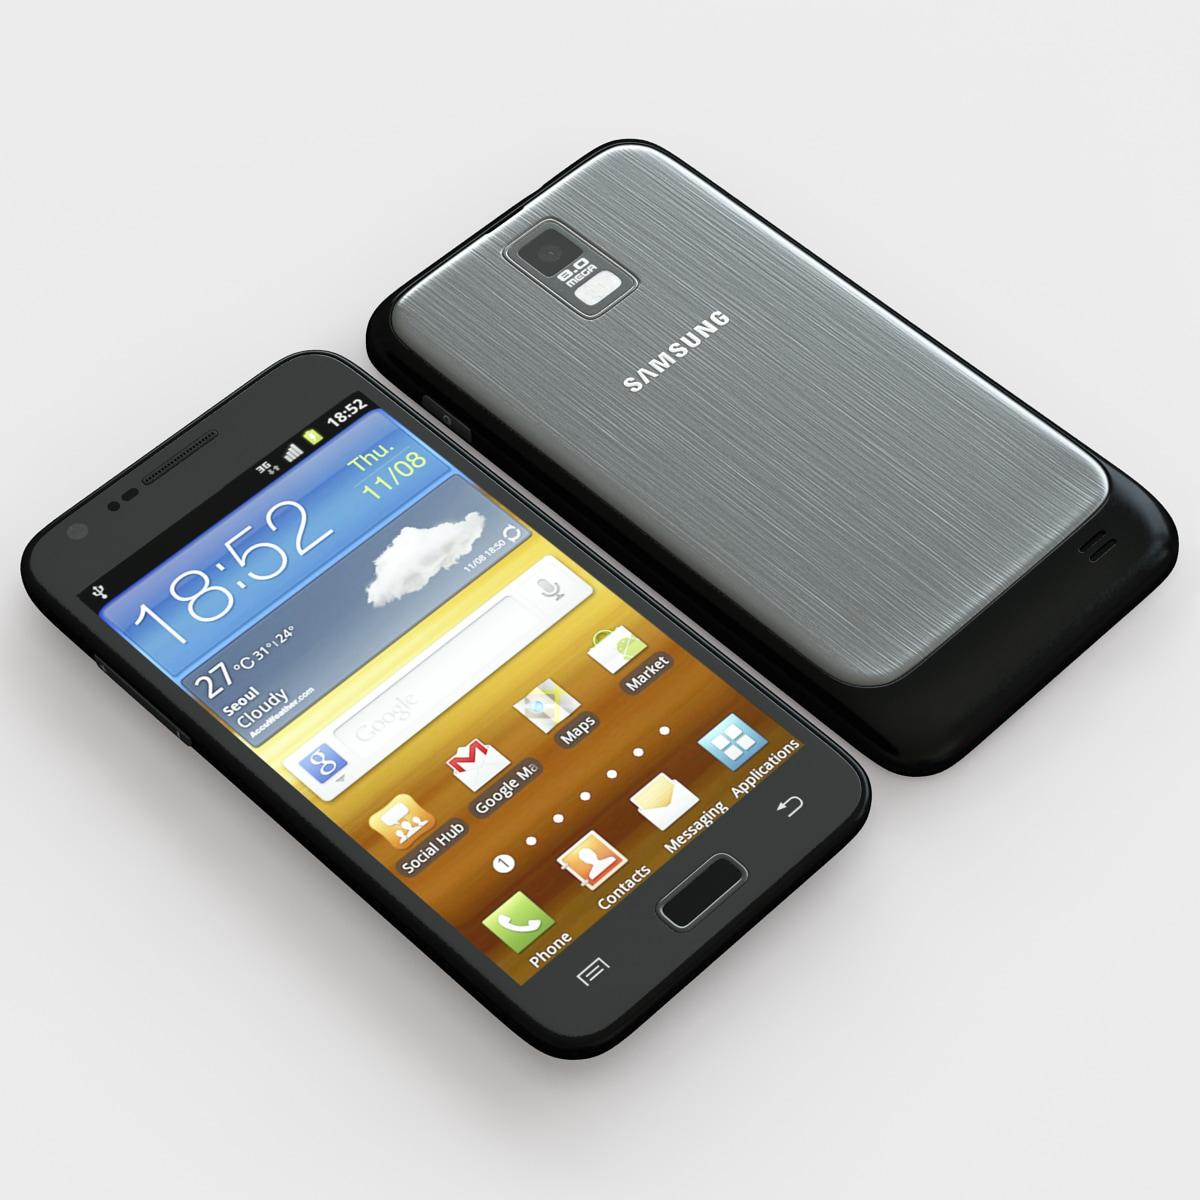 Samsung_Galaxy_S_II_HD_001.jpg